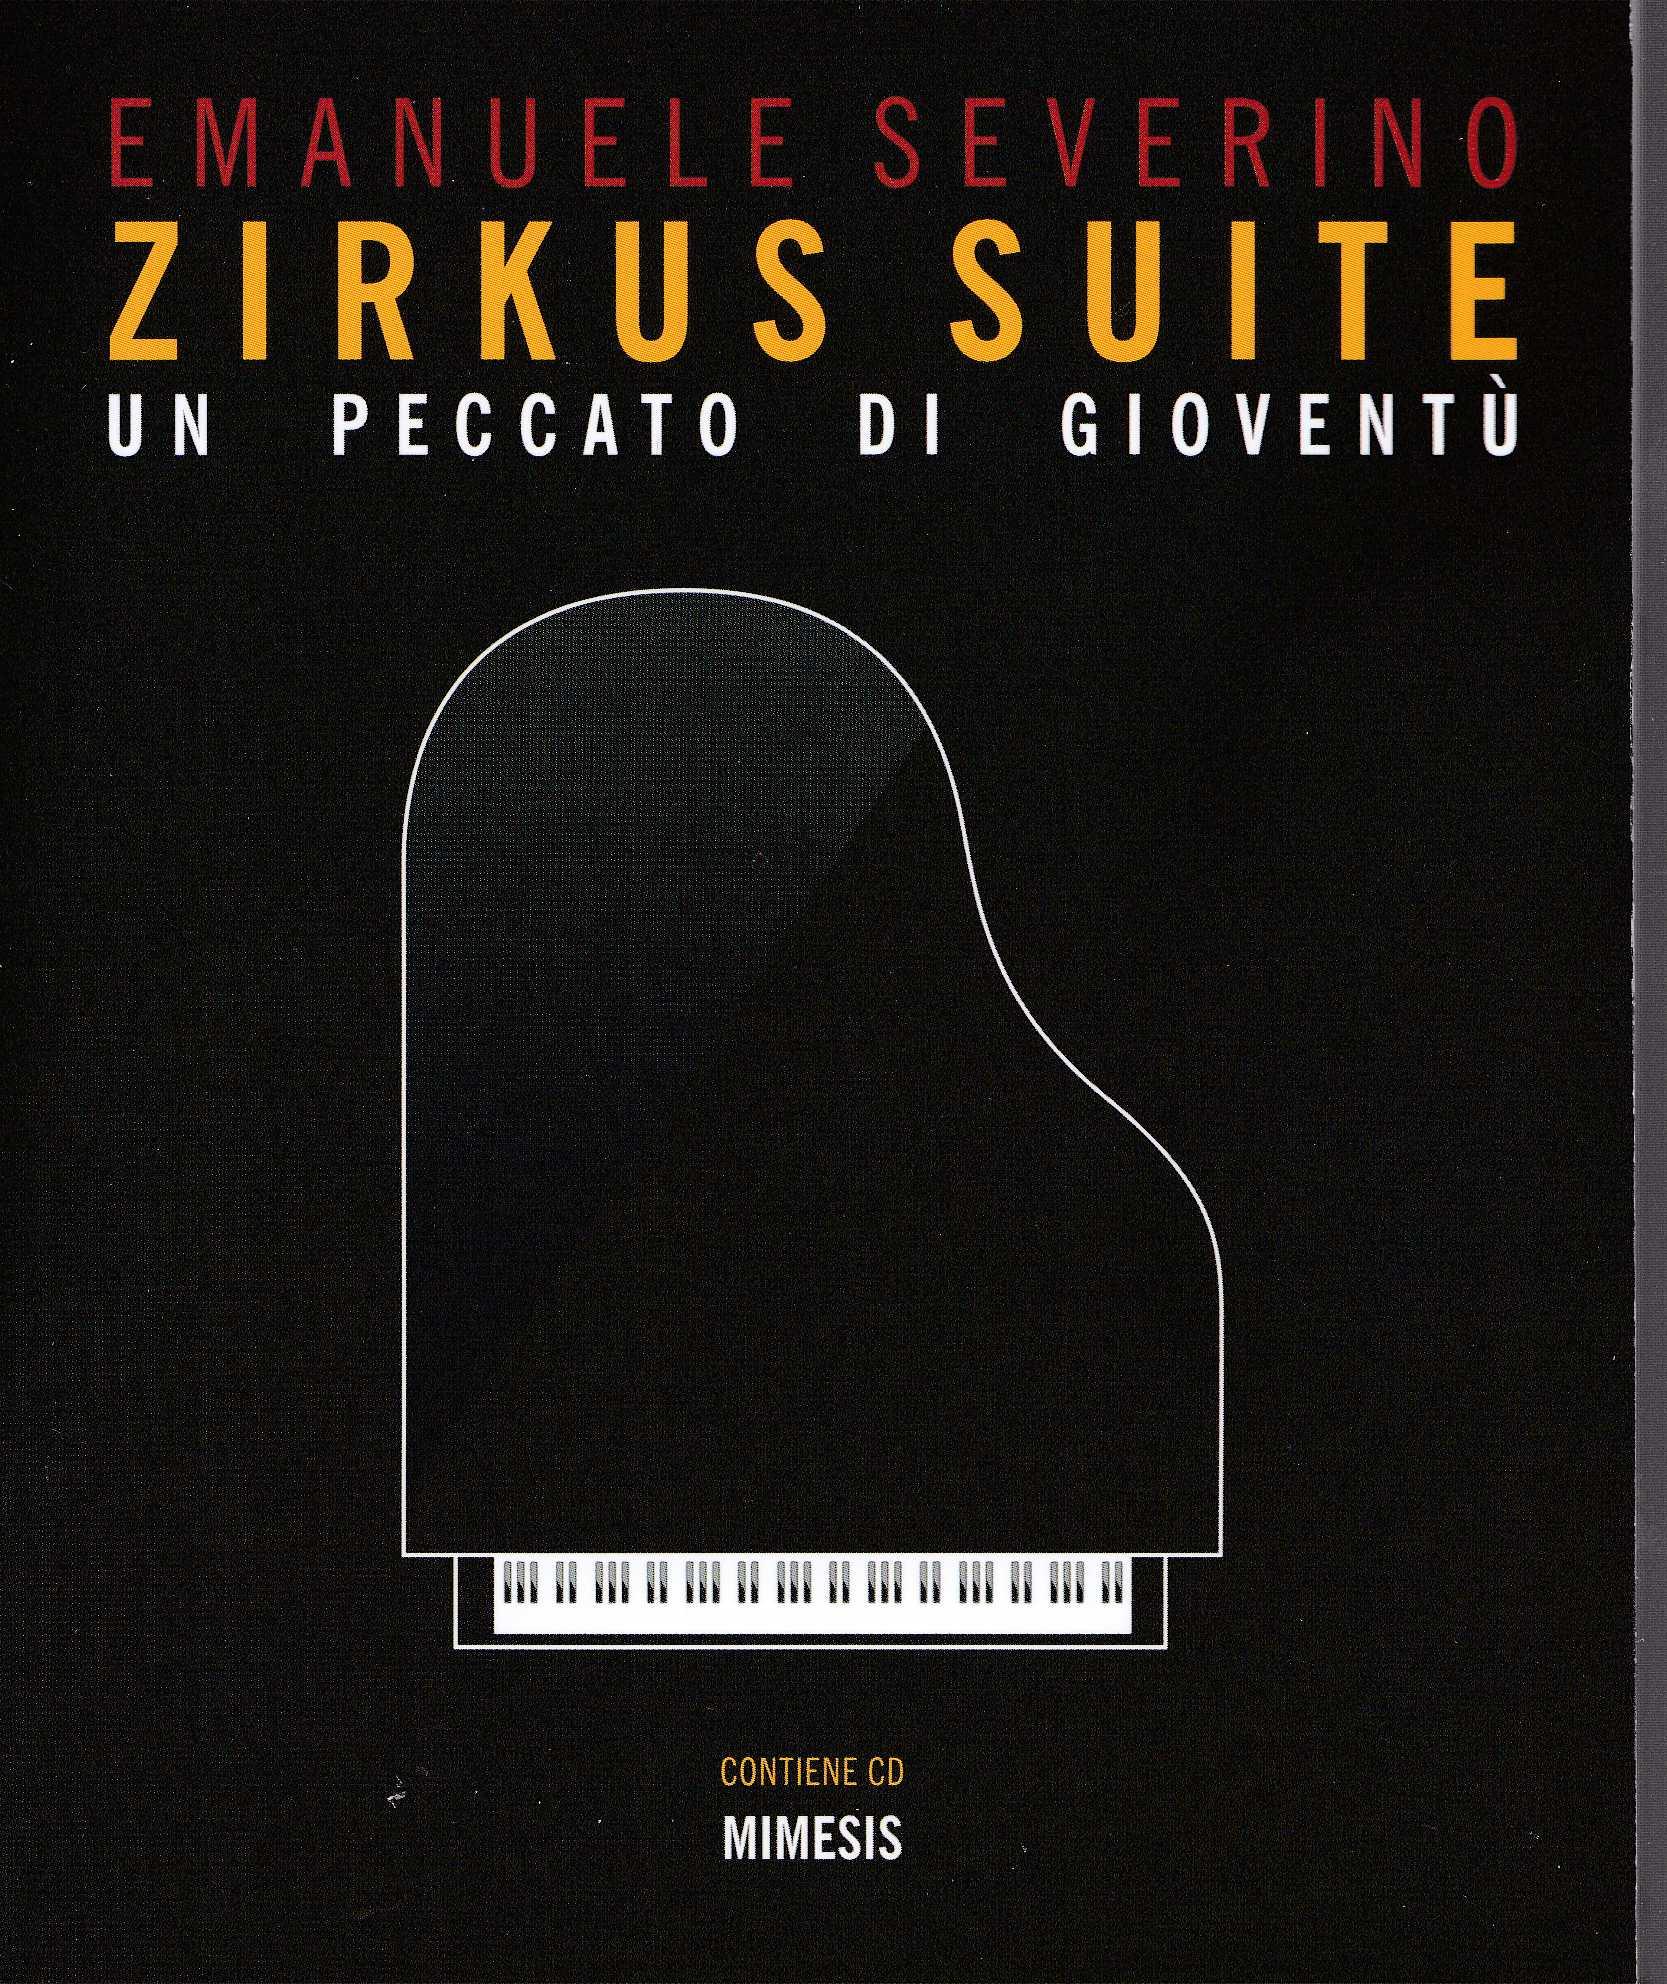 zircus 3187